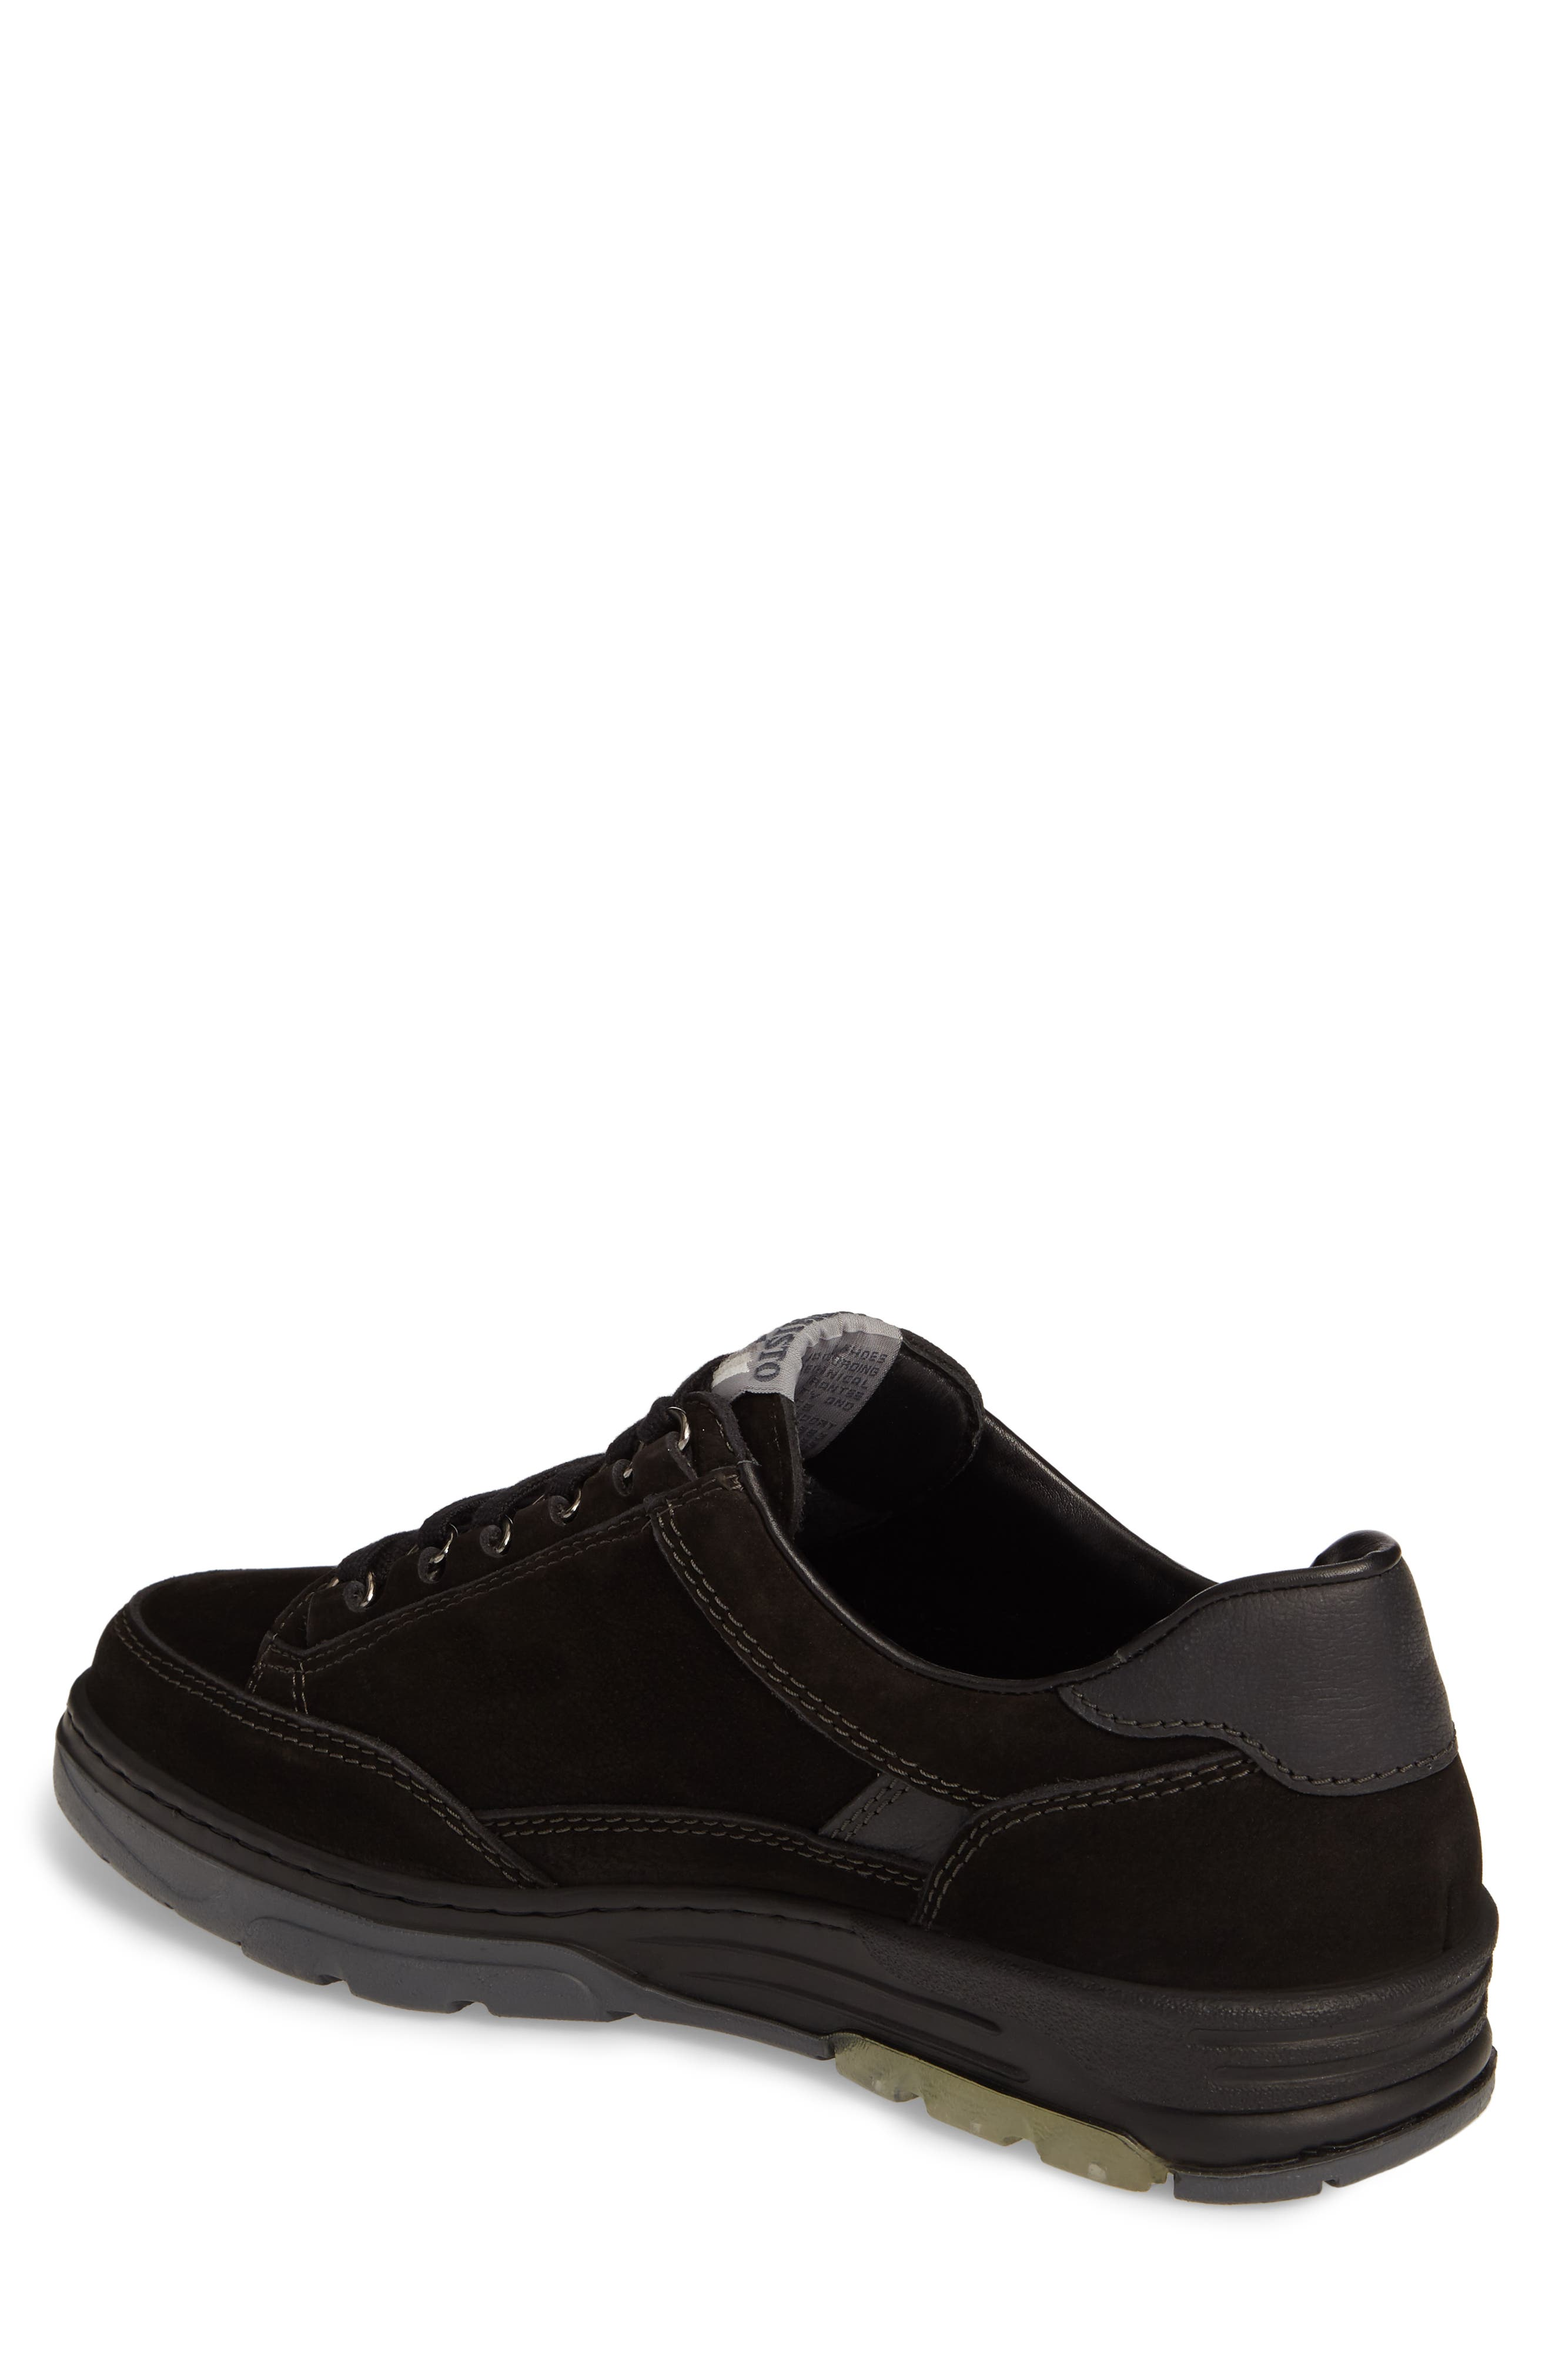 Mick Sneaker,                             Alternate thumbnail 2, color,                             BLACK SPORTBUCK